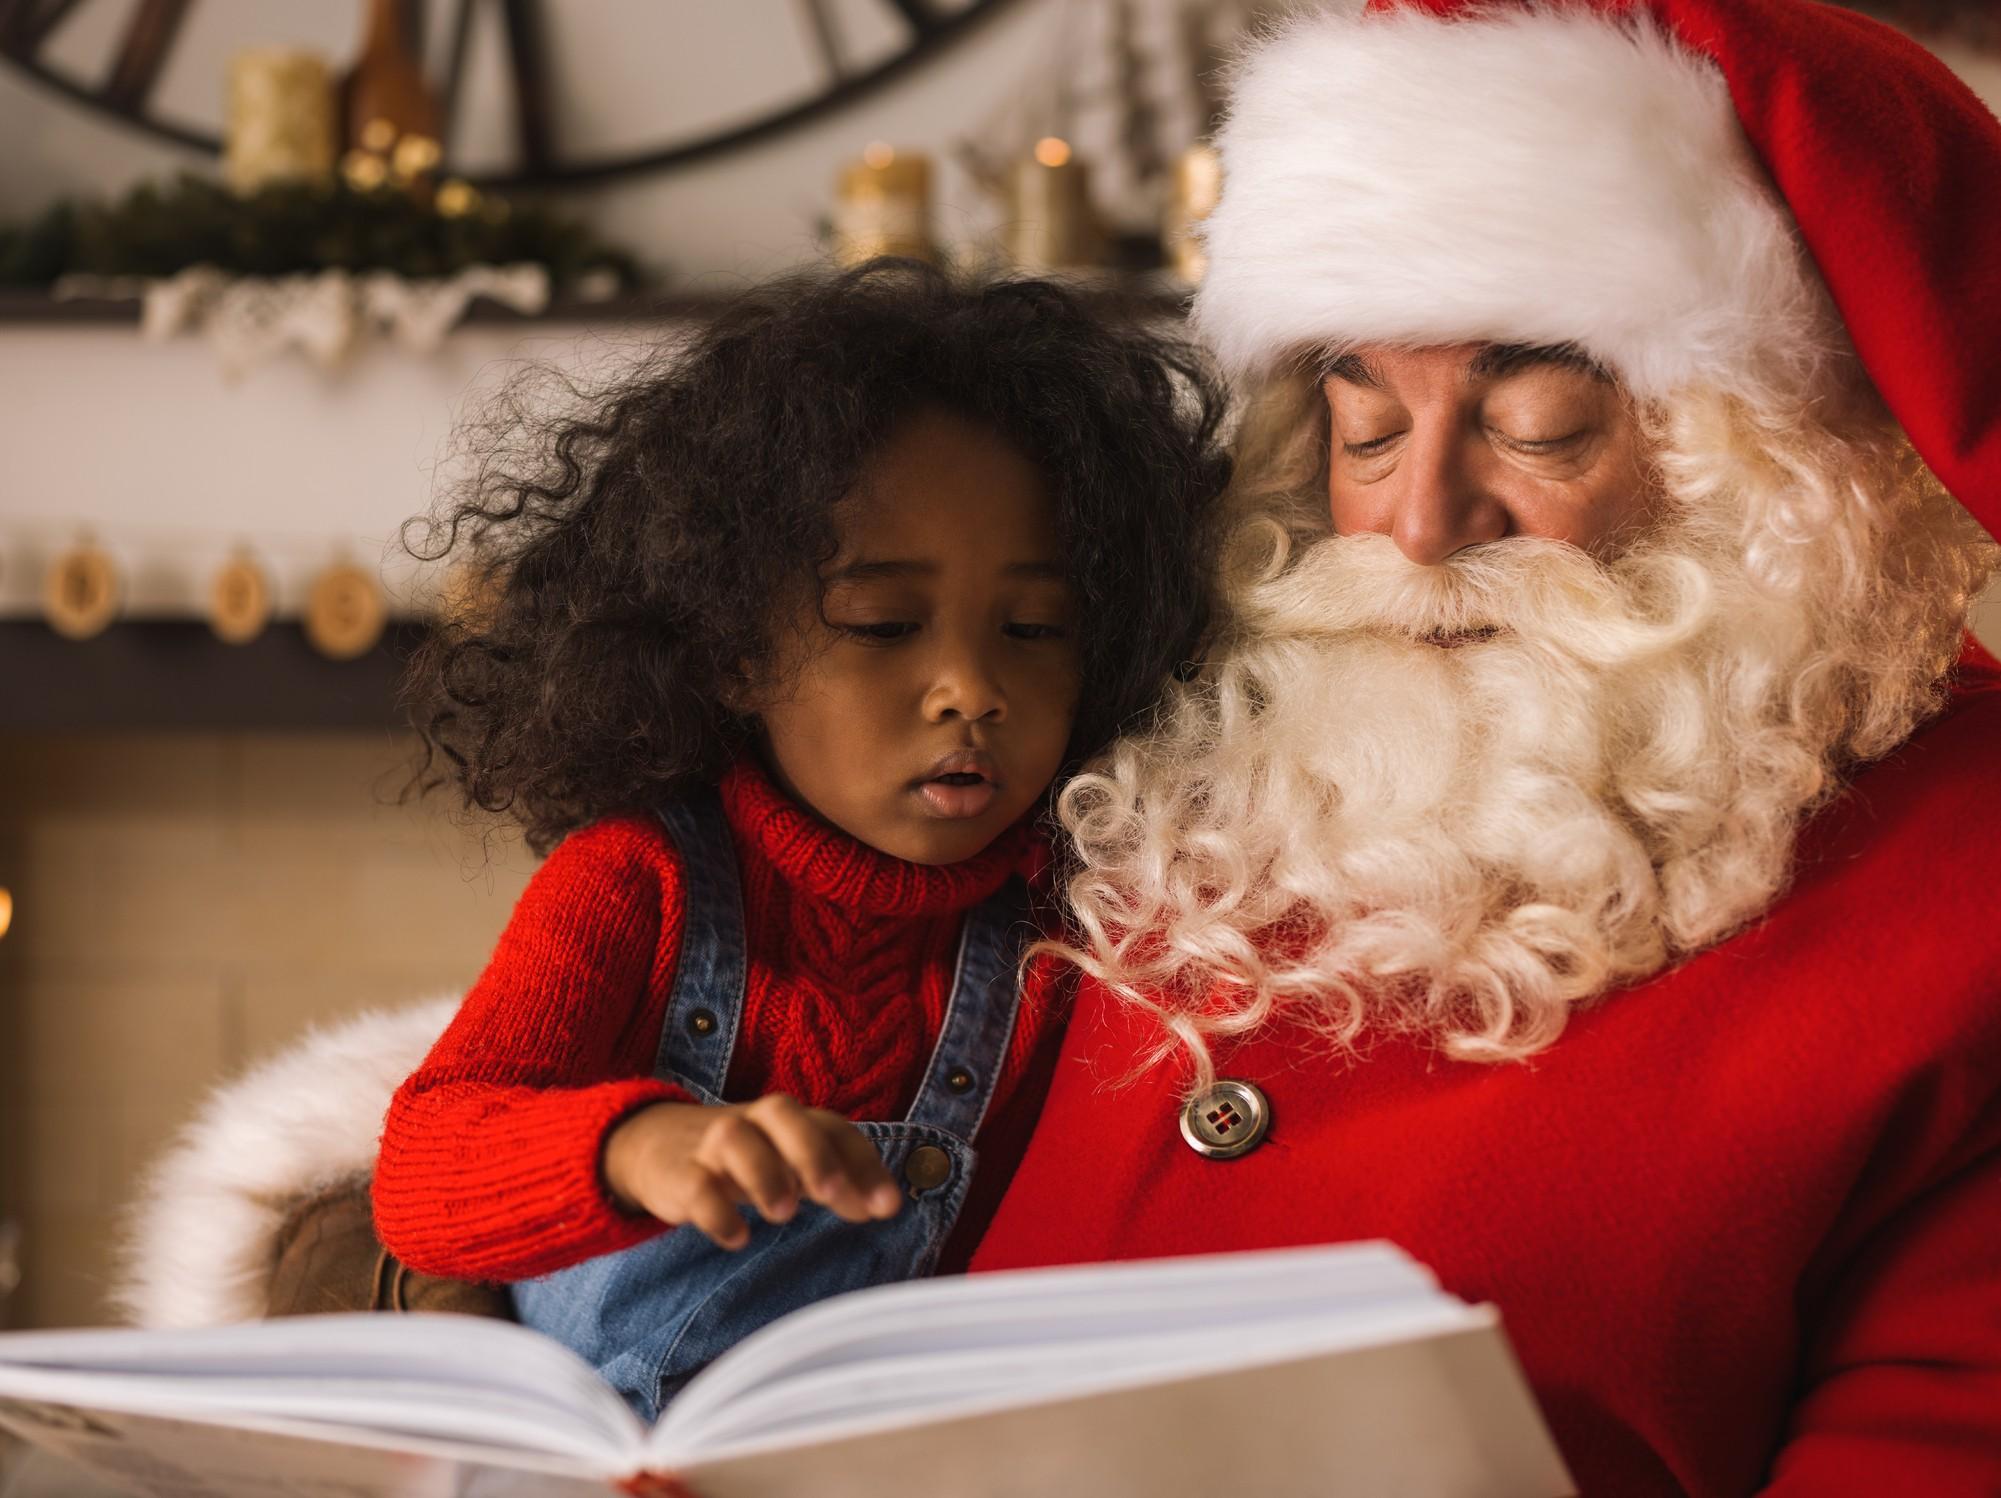 Menina lendo livro no colo do Papai noel (Foto: Thinkstock)